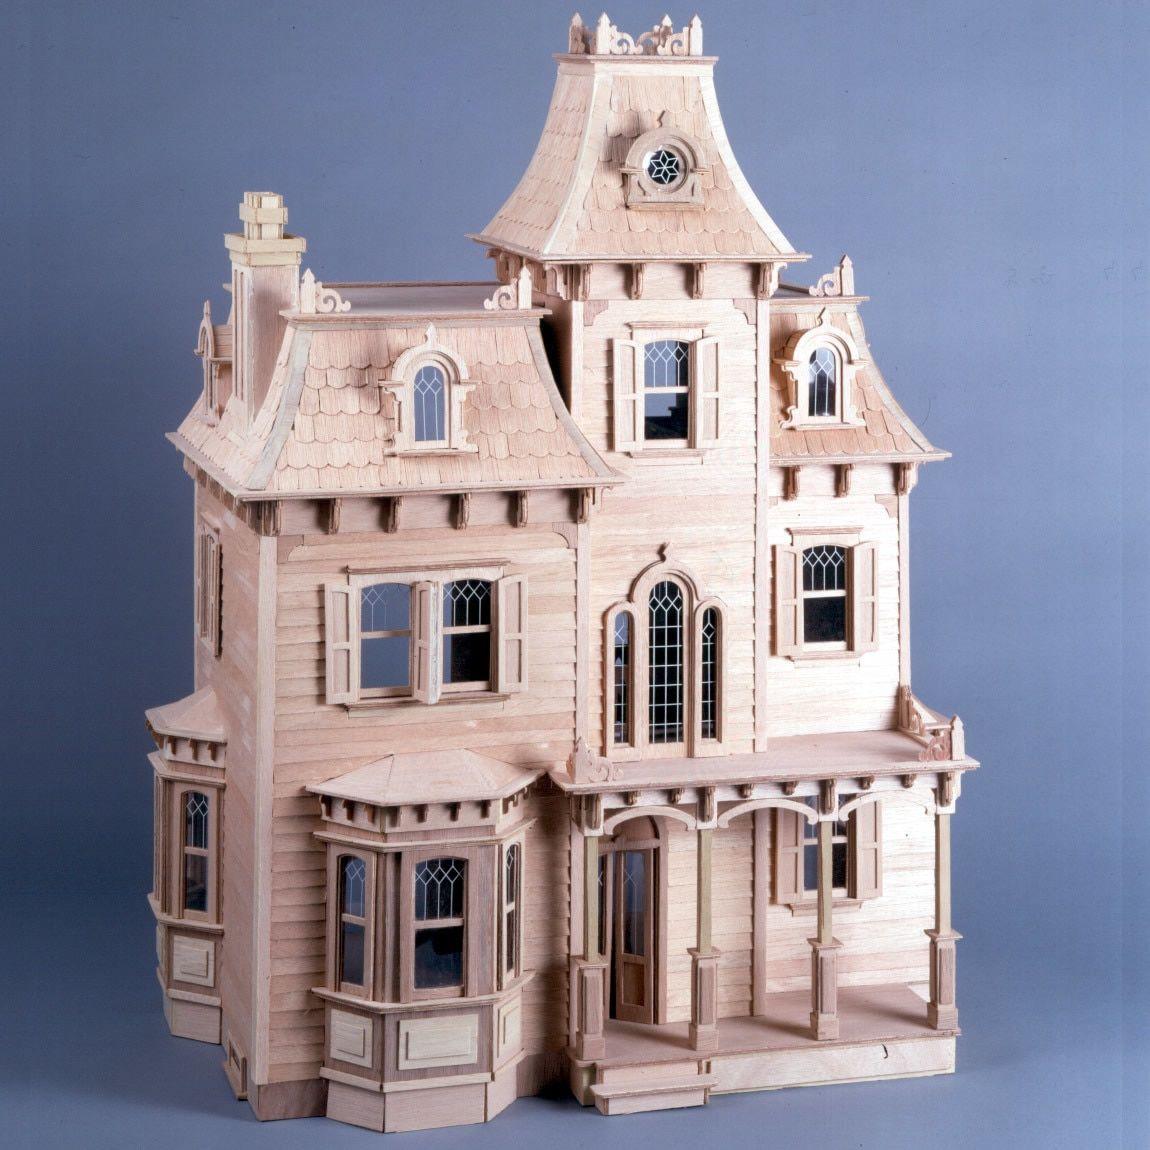 Miniature Clapboard Siding Beacon Hill Dollhouse